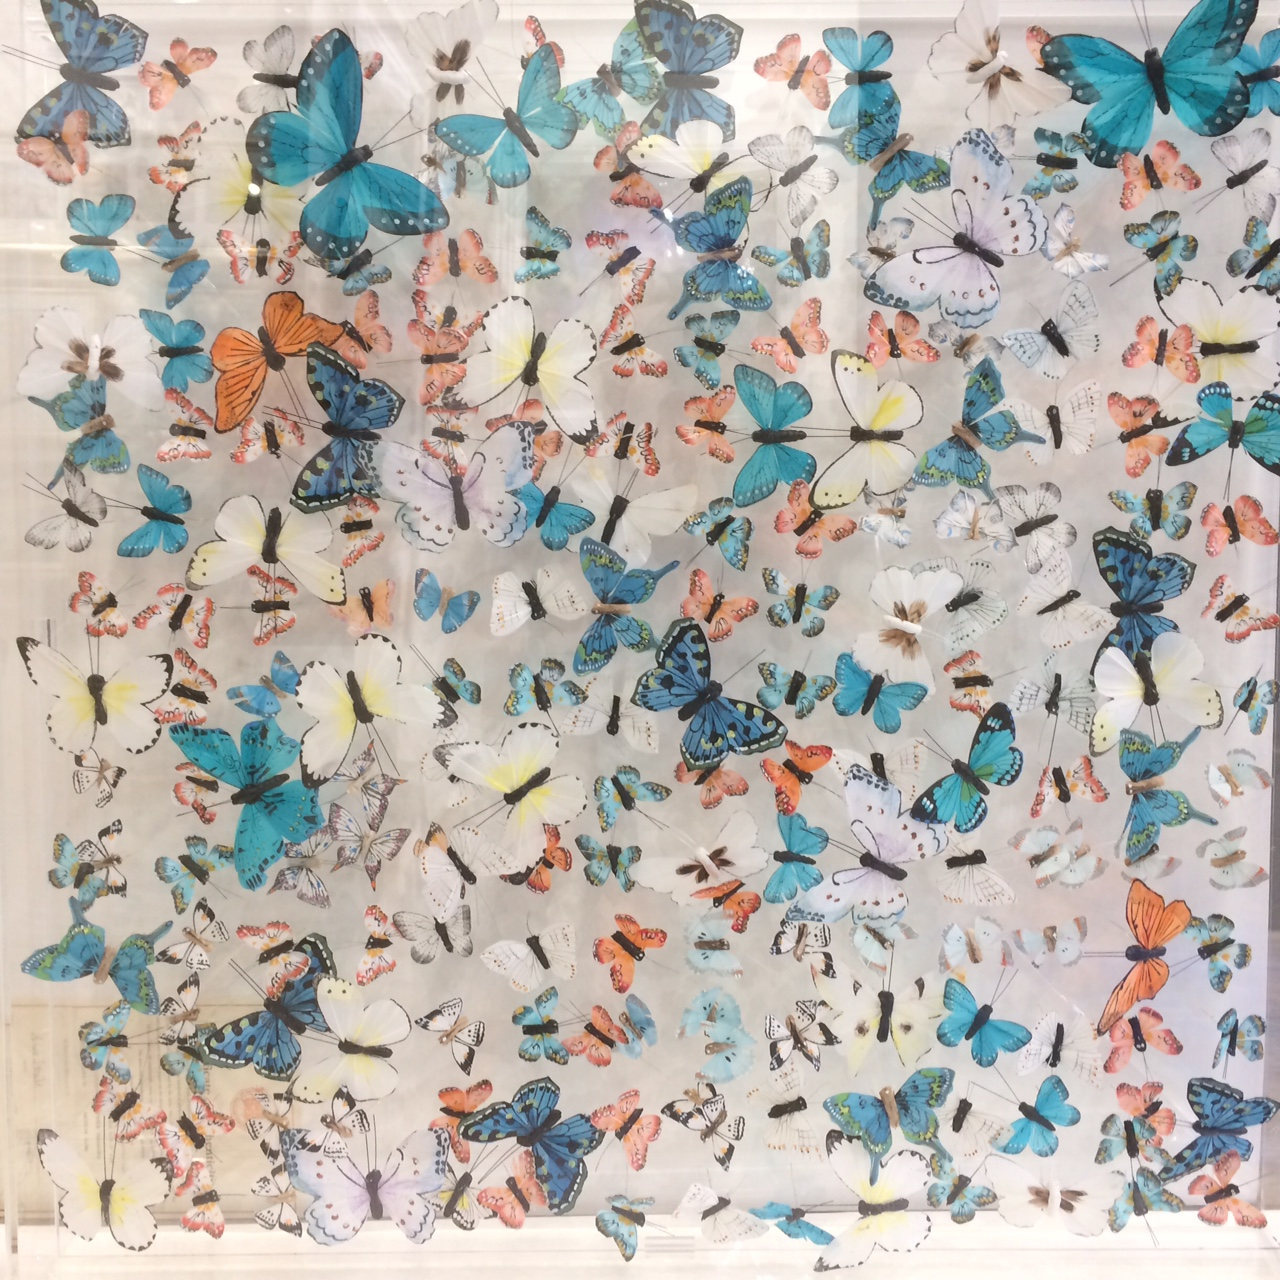 Butterfly Installation 750 x 750 by Michael Olsen